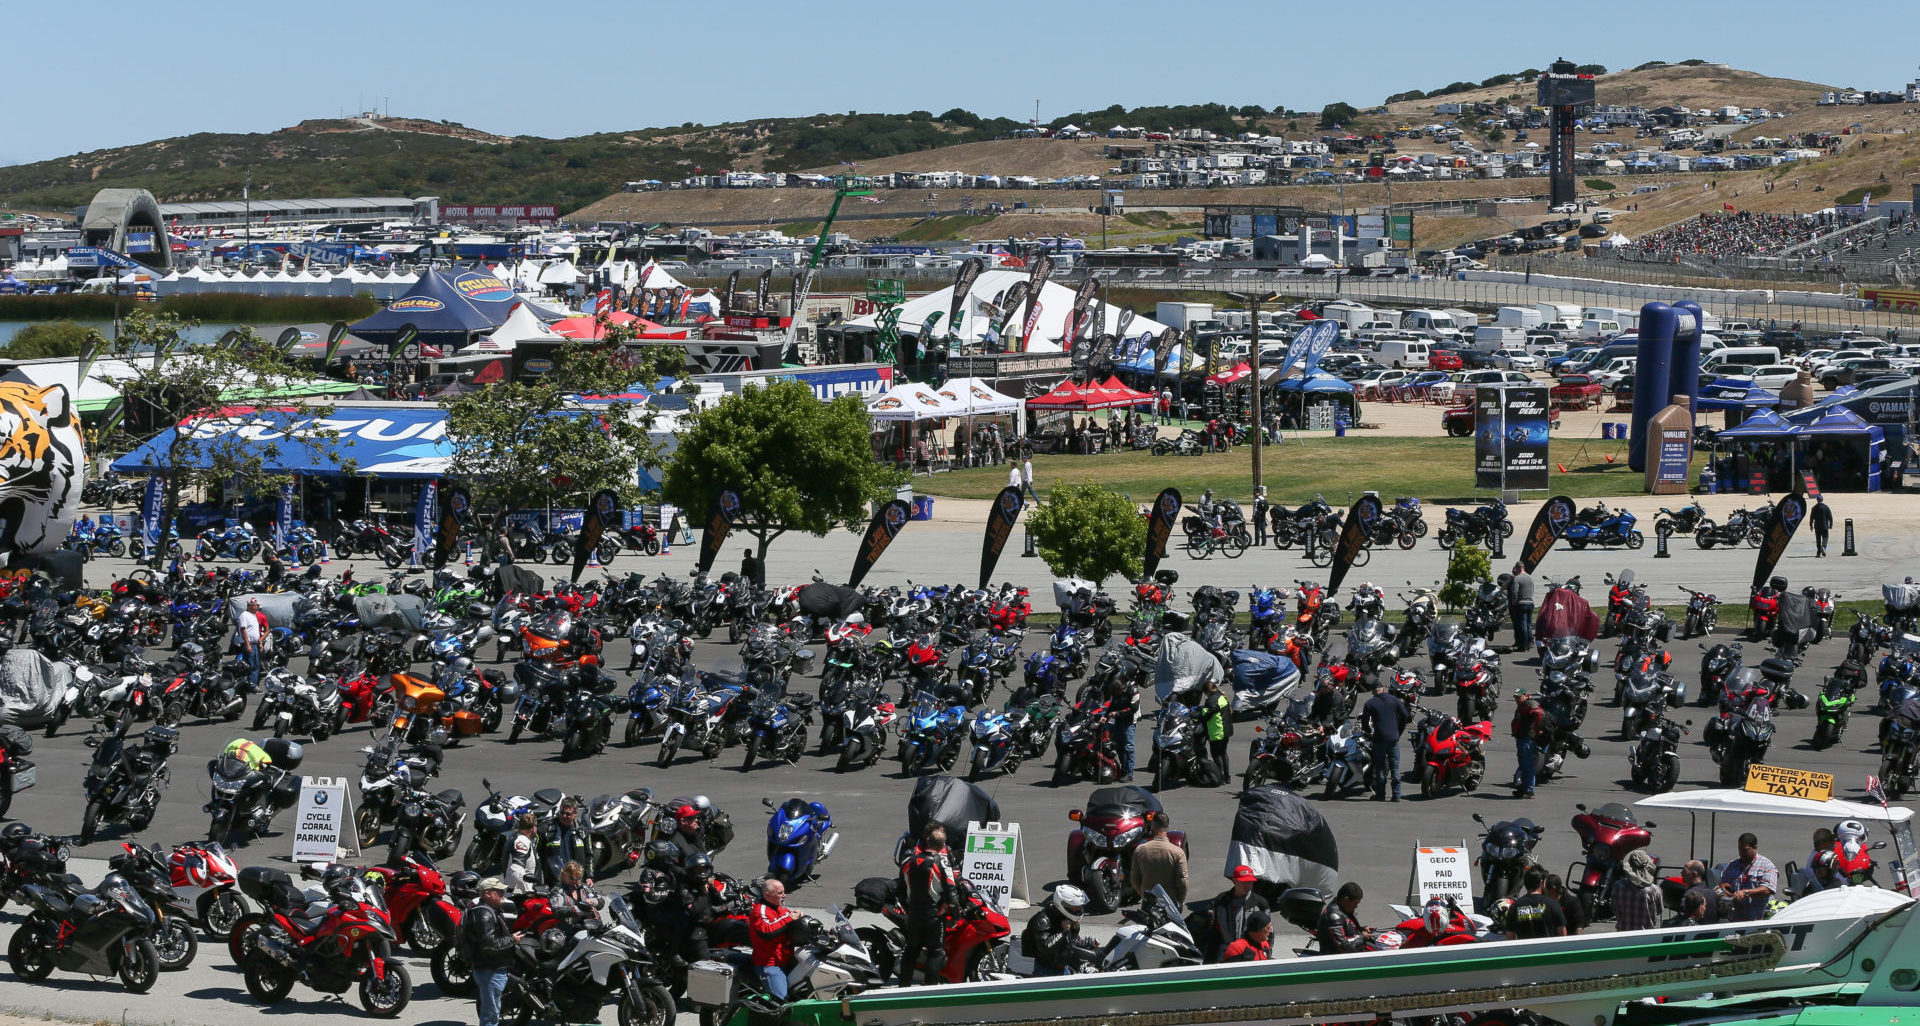 A scene from the MotoAmerica/World Superbike event at Laguna Seca Raceway in 2019. Photo by Brian J. Nelson.